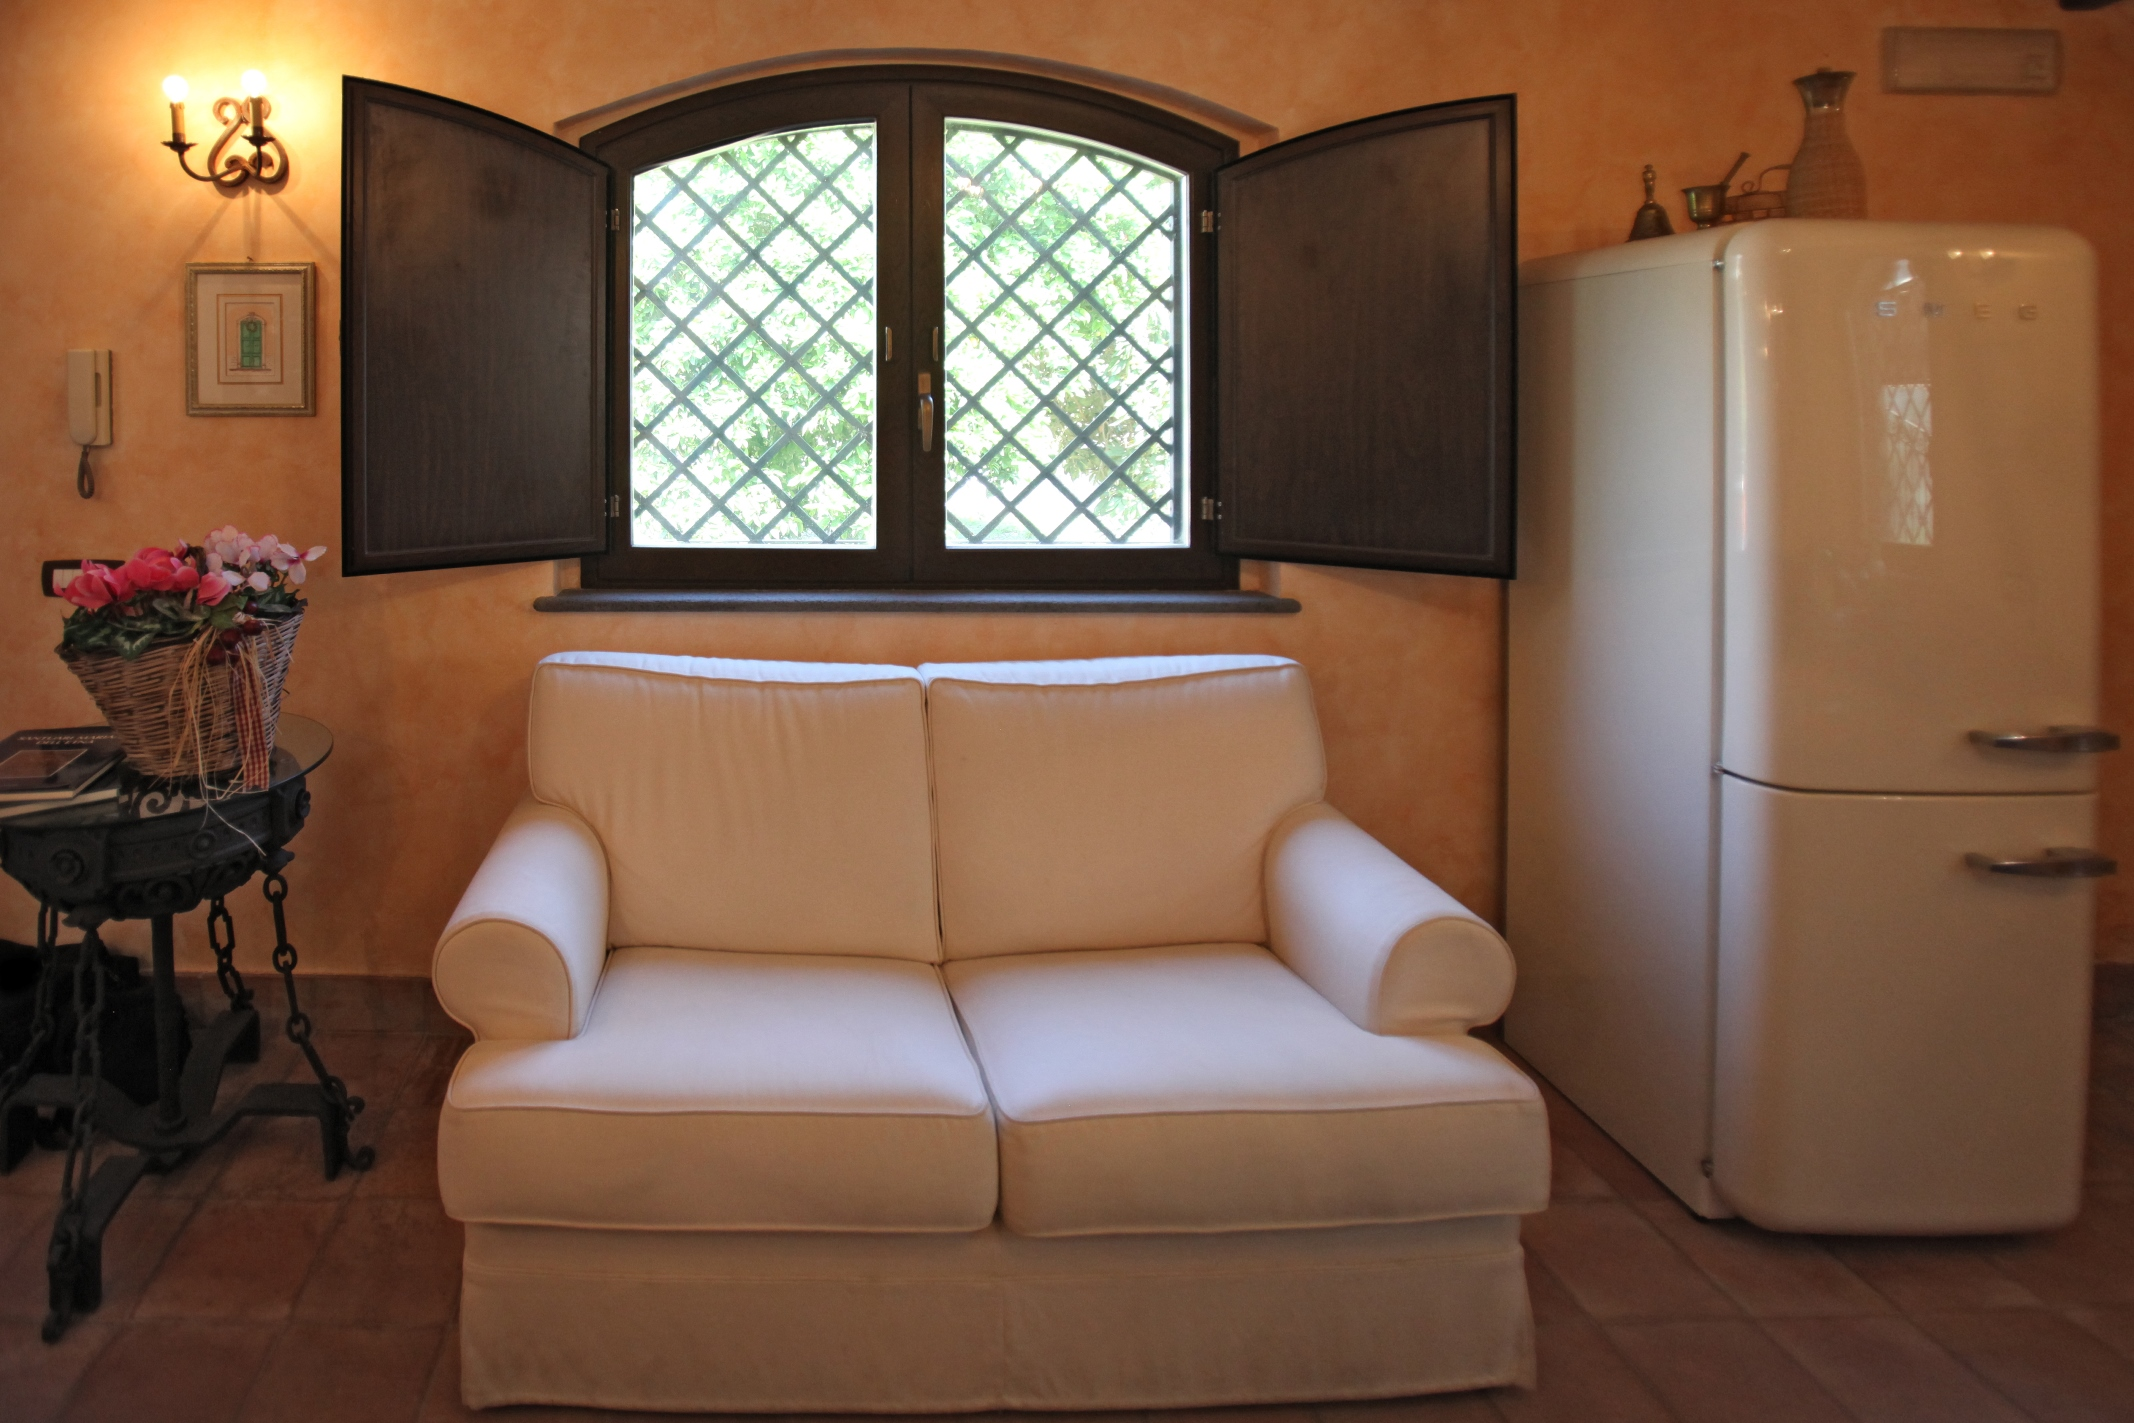 Maison de vacances A Casa di Ludo mit parkplatz (2124257), Catania, Catania, Sicile, Italie, image 7